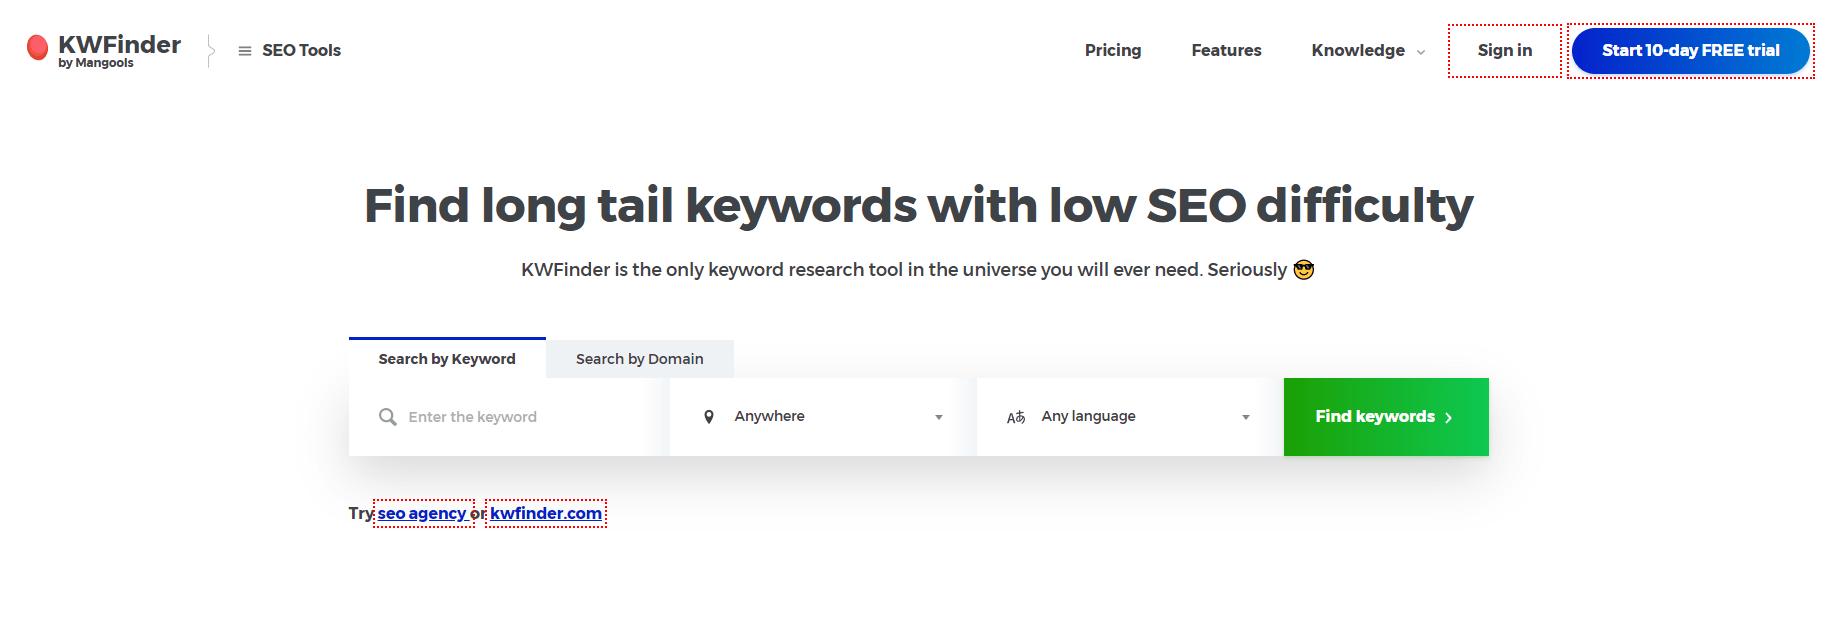 keyword tool kwfinder